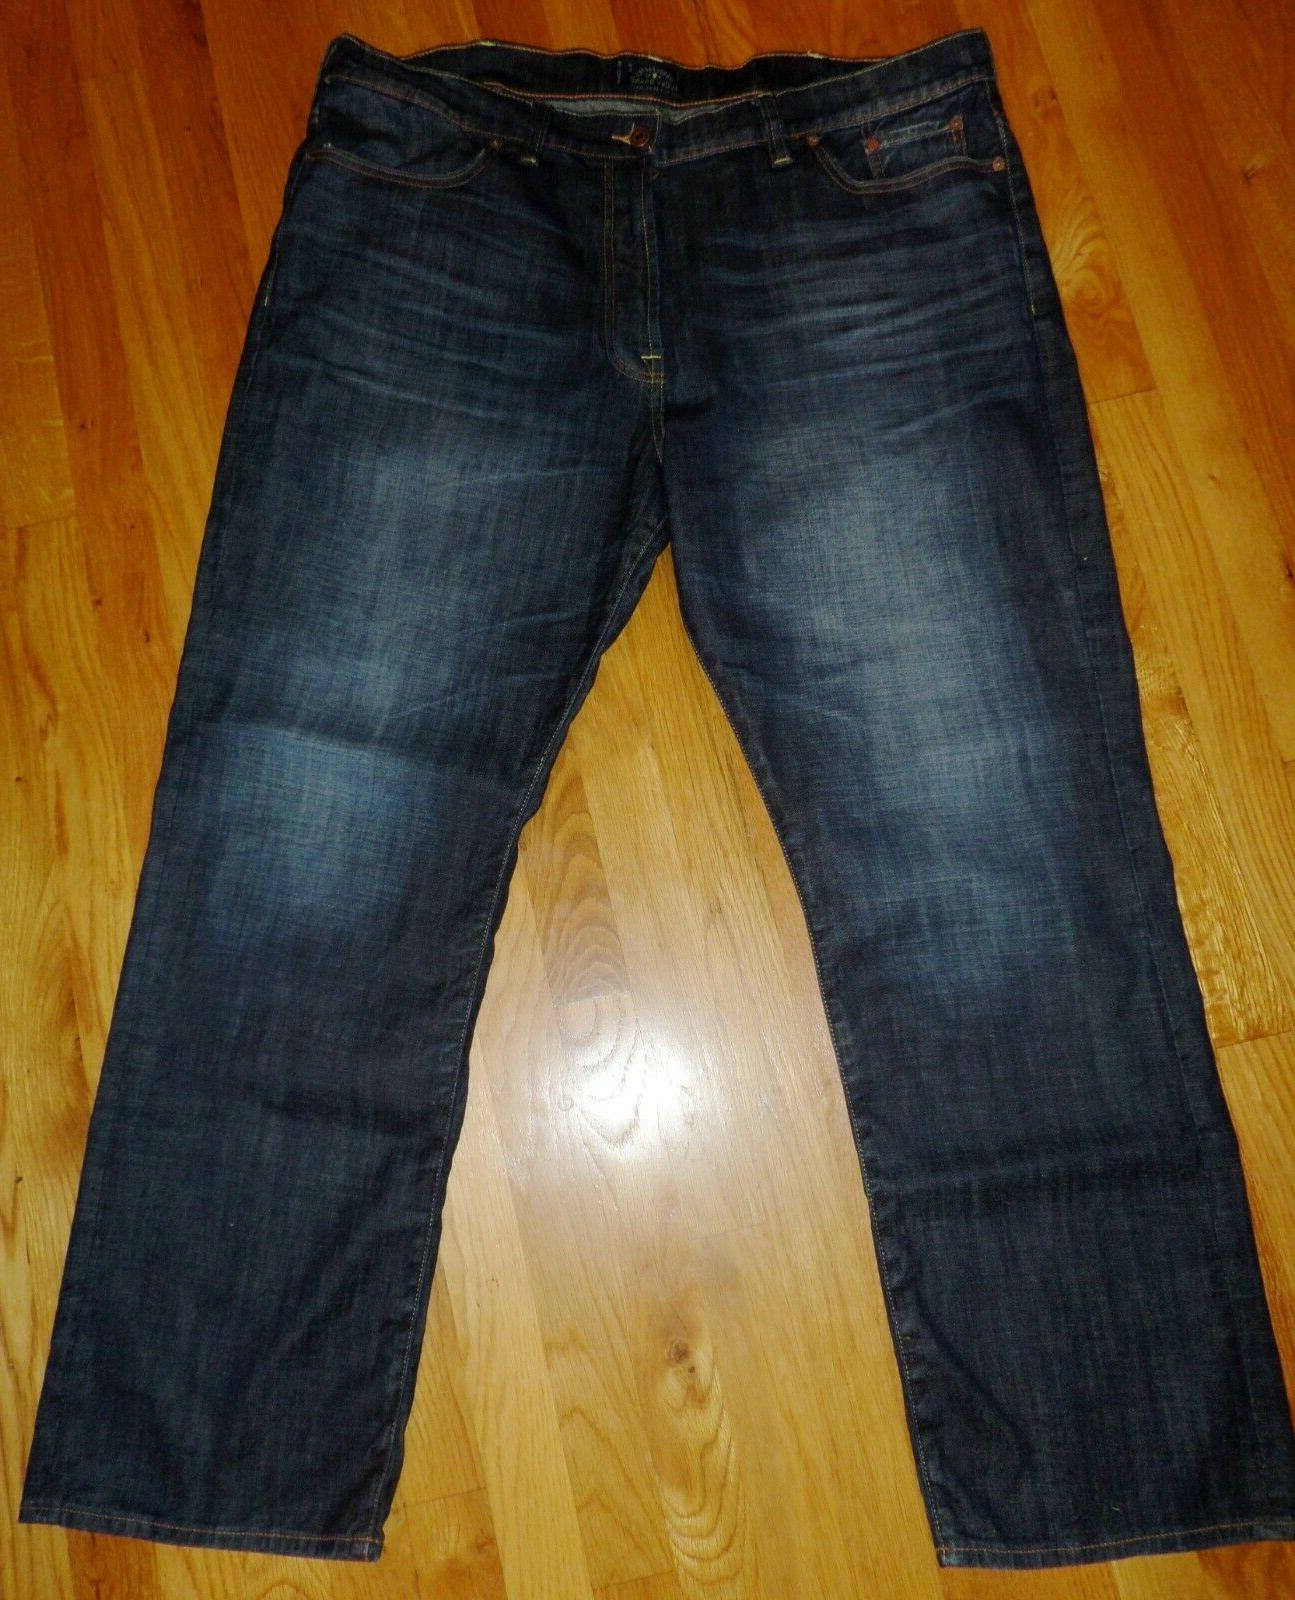 NWOT Men's 181 Straight Jeans Size 34